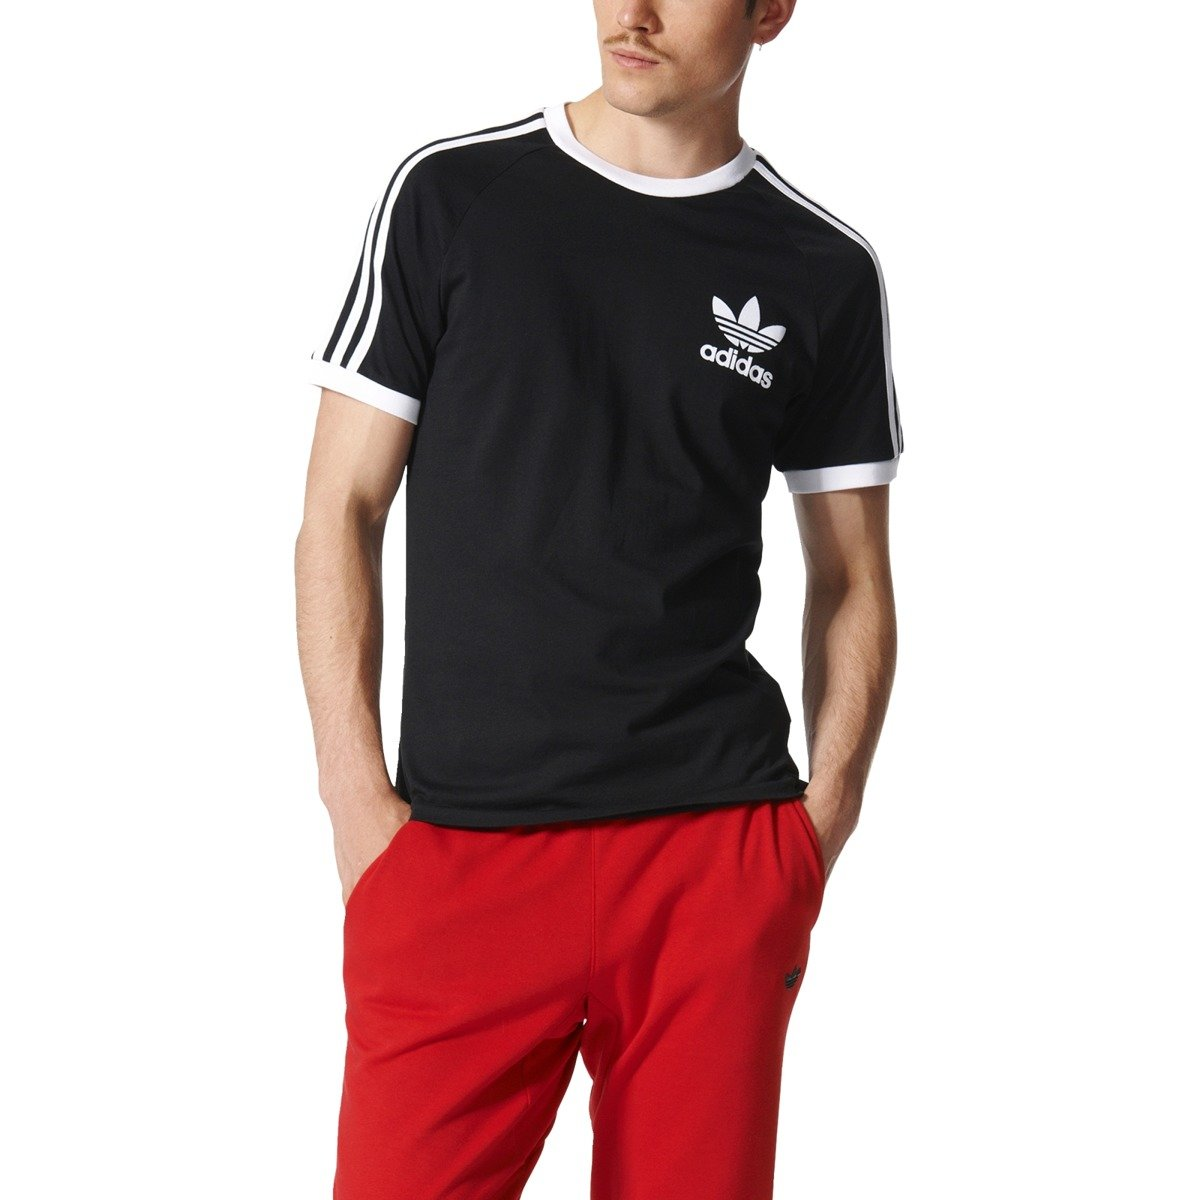 Adidas originals clfn t shirt az8127 basketball for Adidas custom t shirts